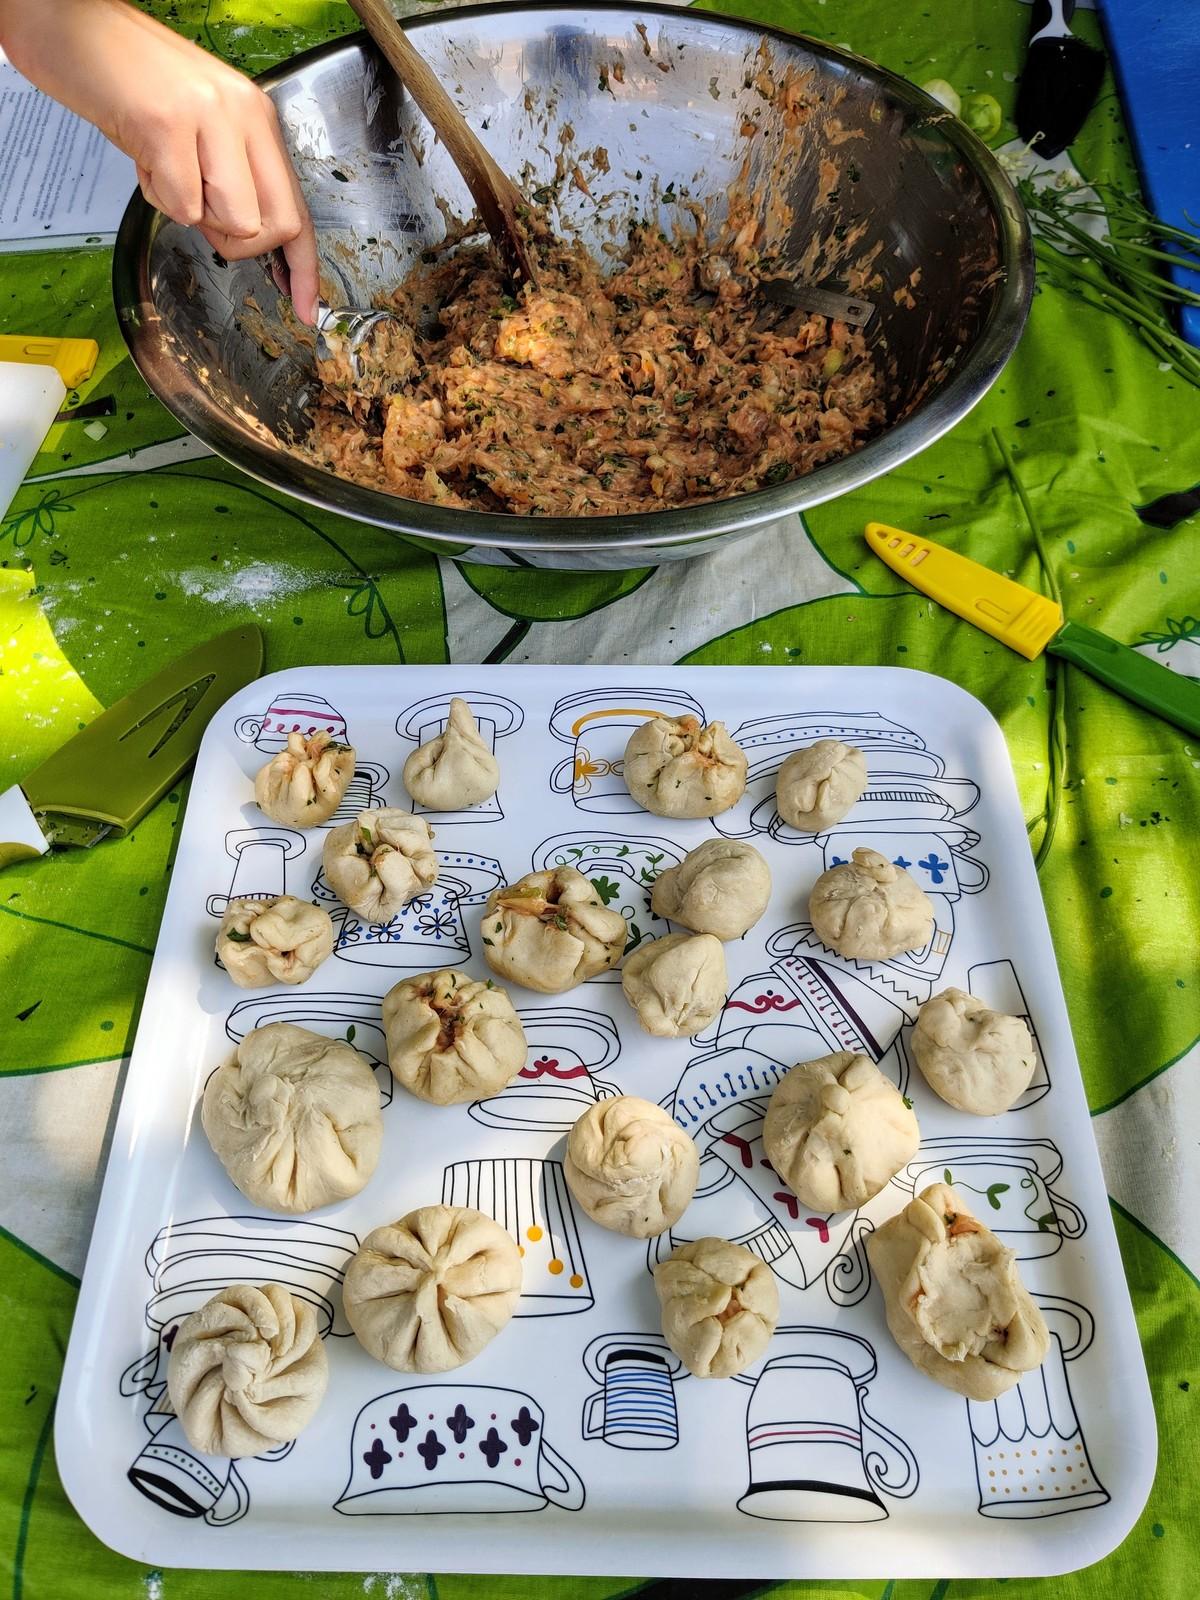 a pan of dumplings with a bowl of dumpling mix behind them.